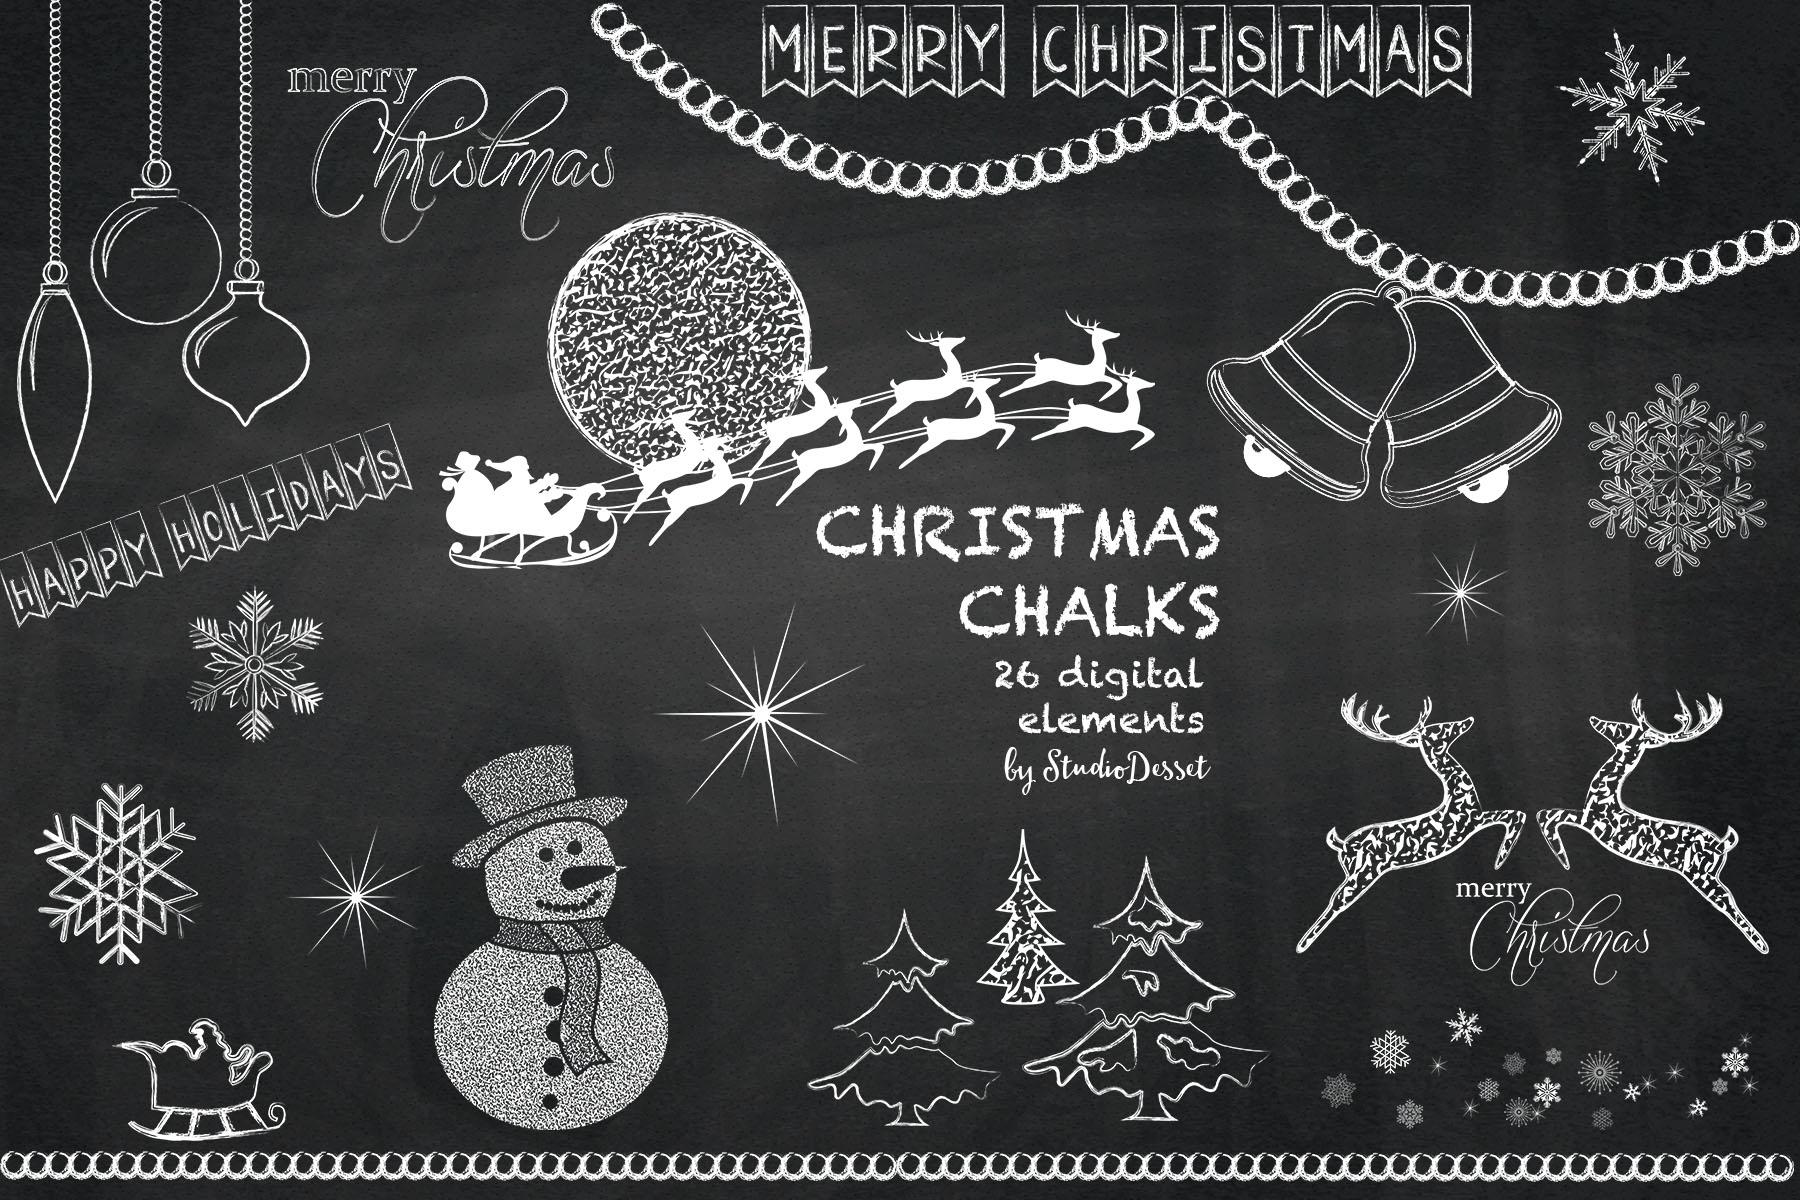 Christmas Chalkboard.Christmas Chalkboard Cliparts